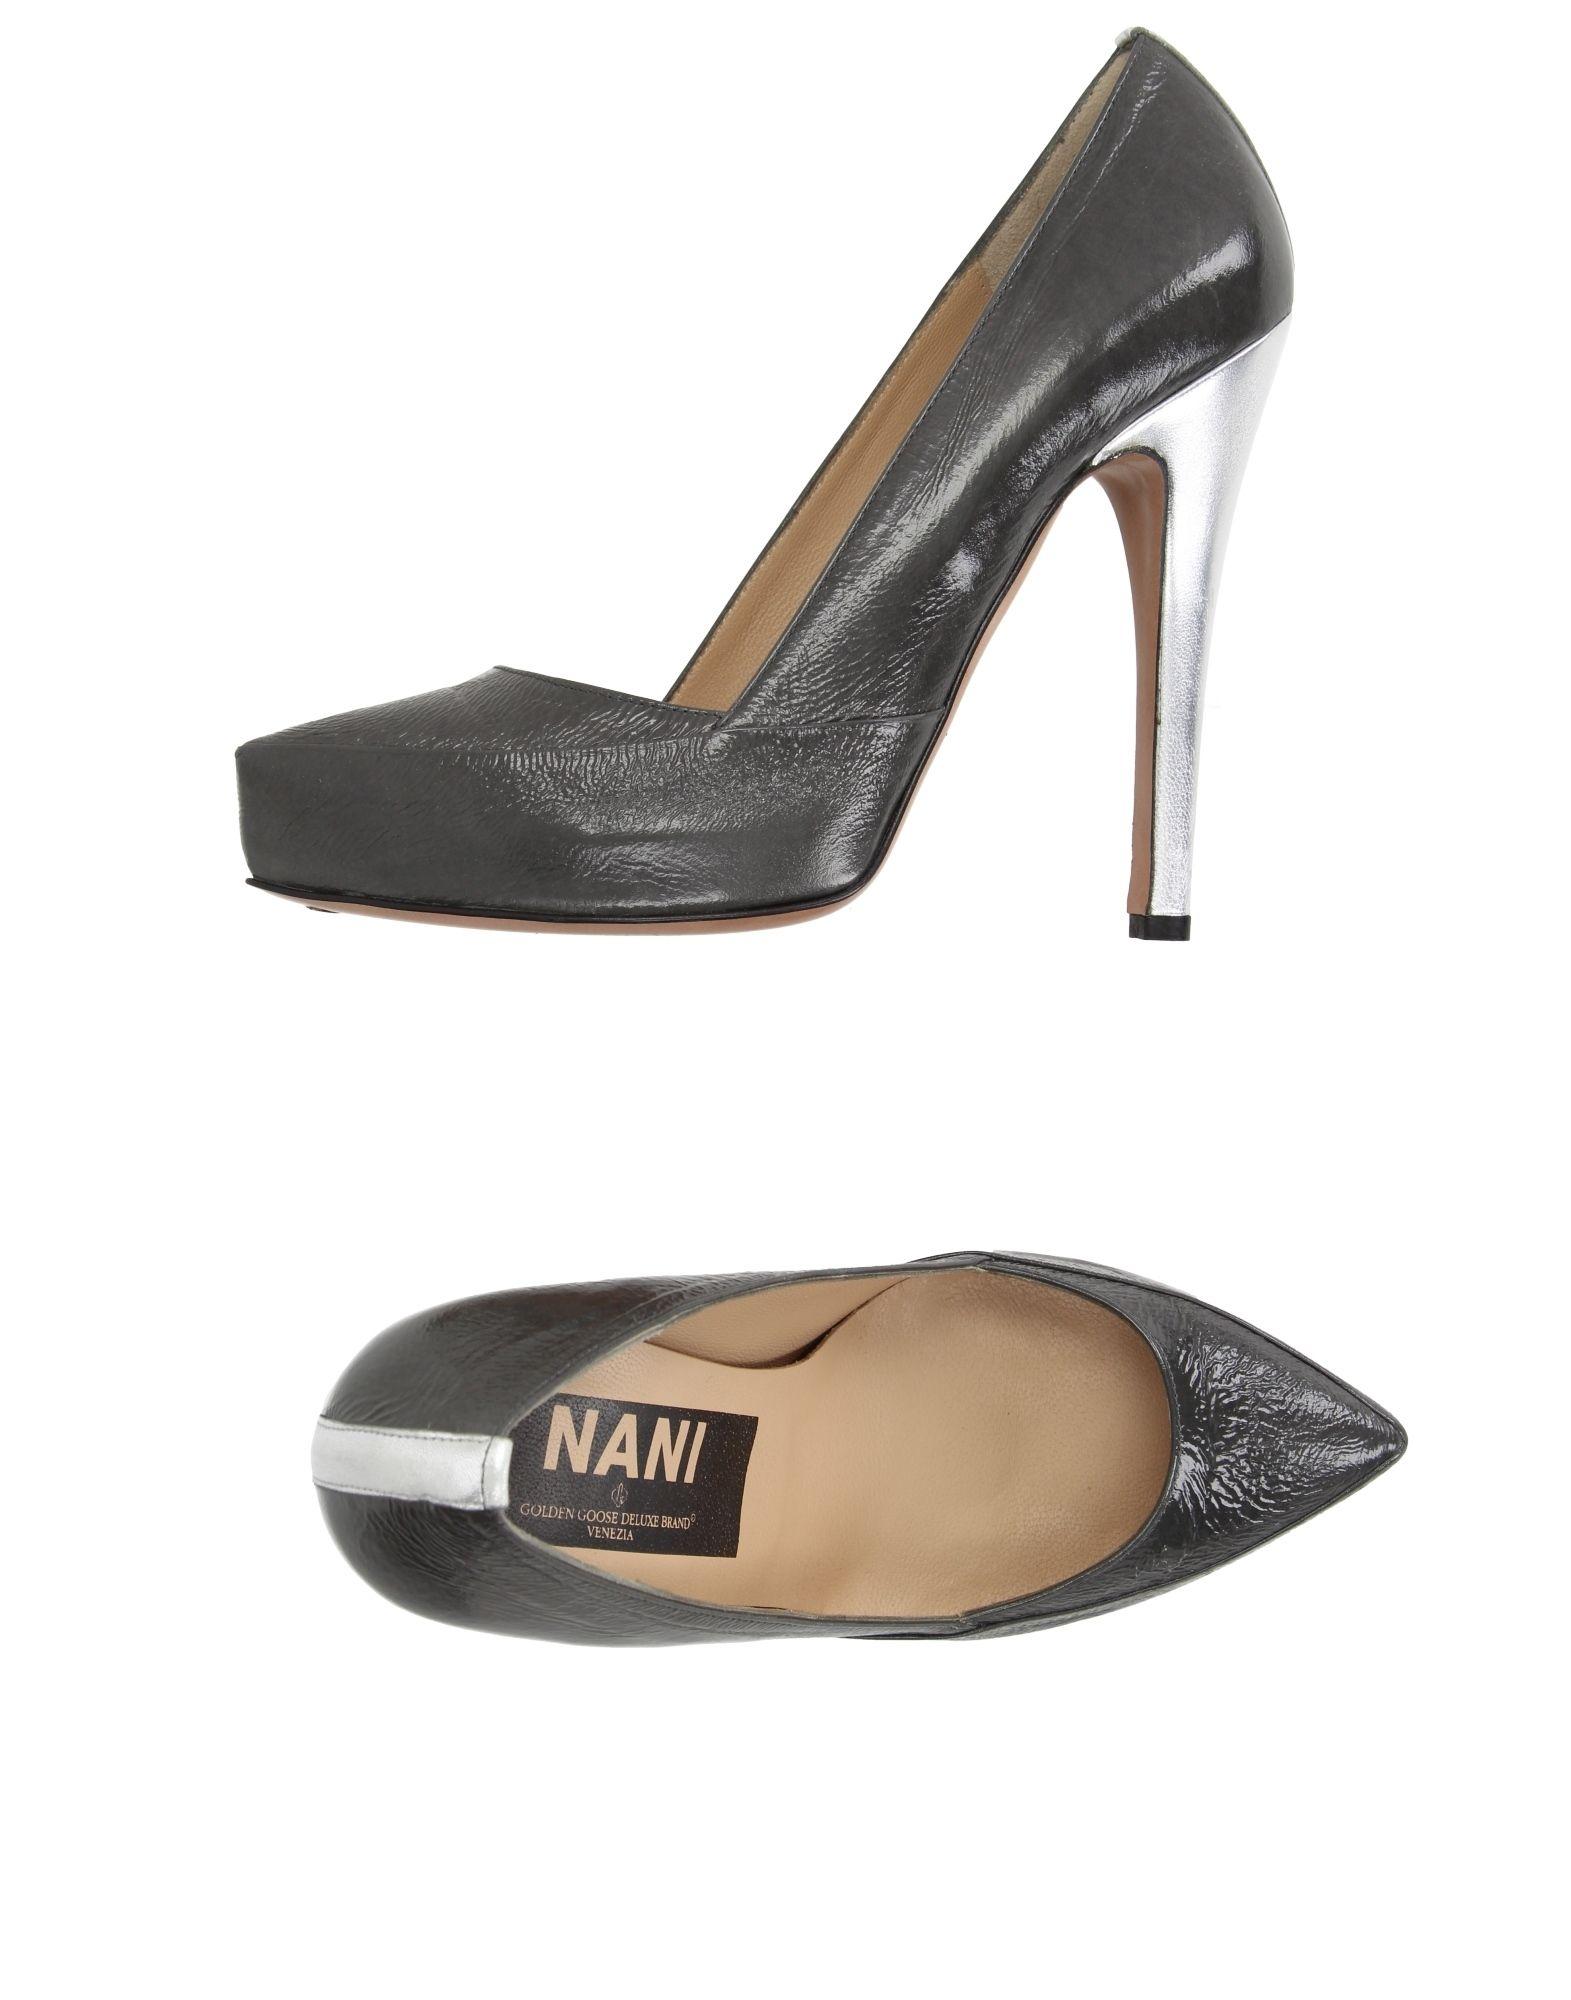 Golden Goose Deluxe Brand Pumps Damen  11186290TO Gute Qualität beliebte Schuhe